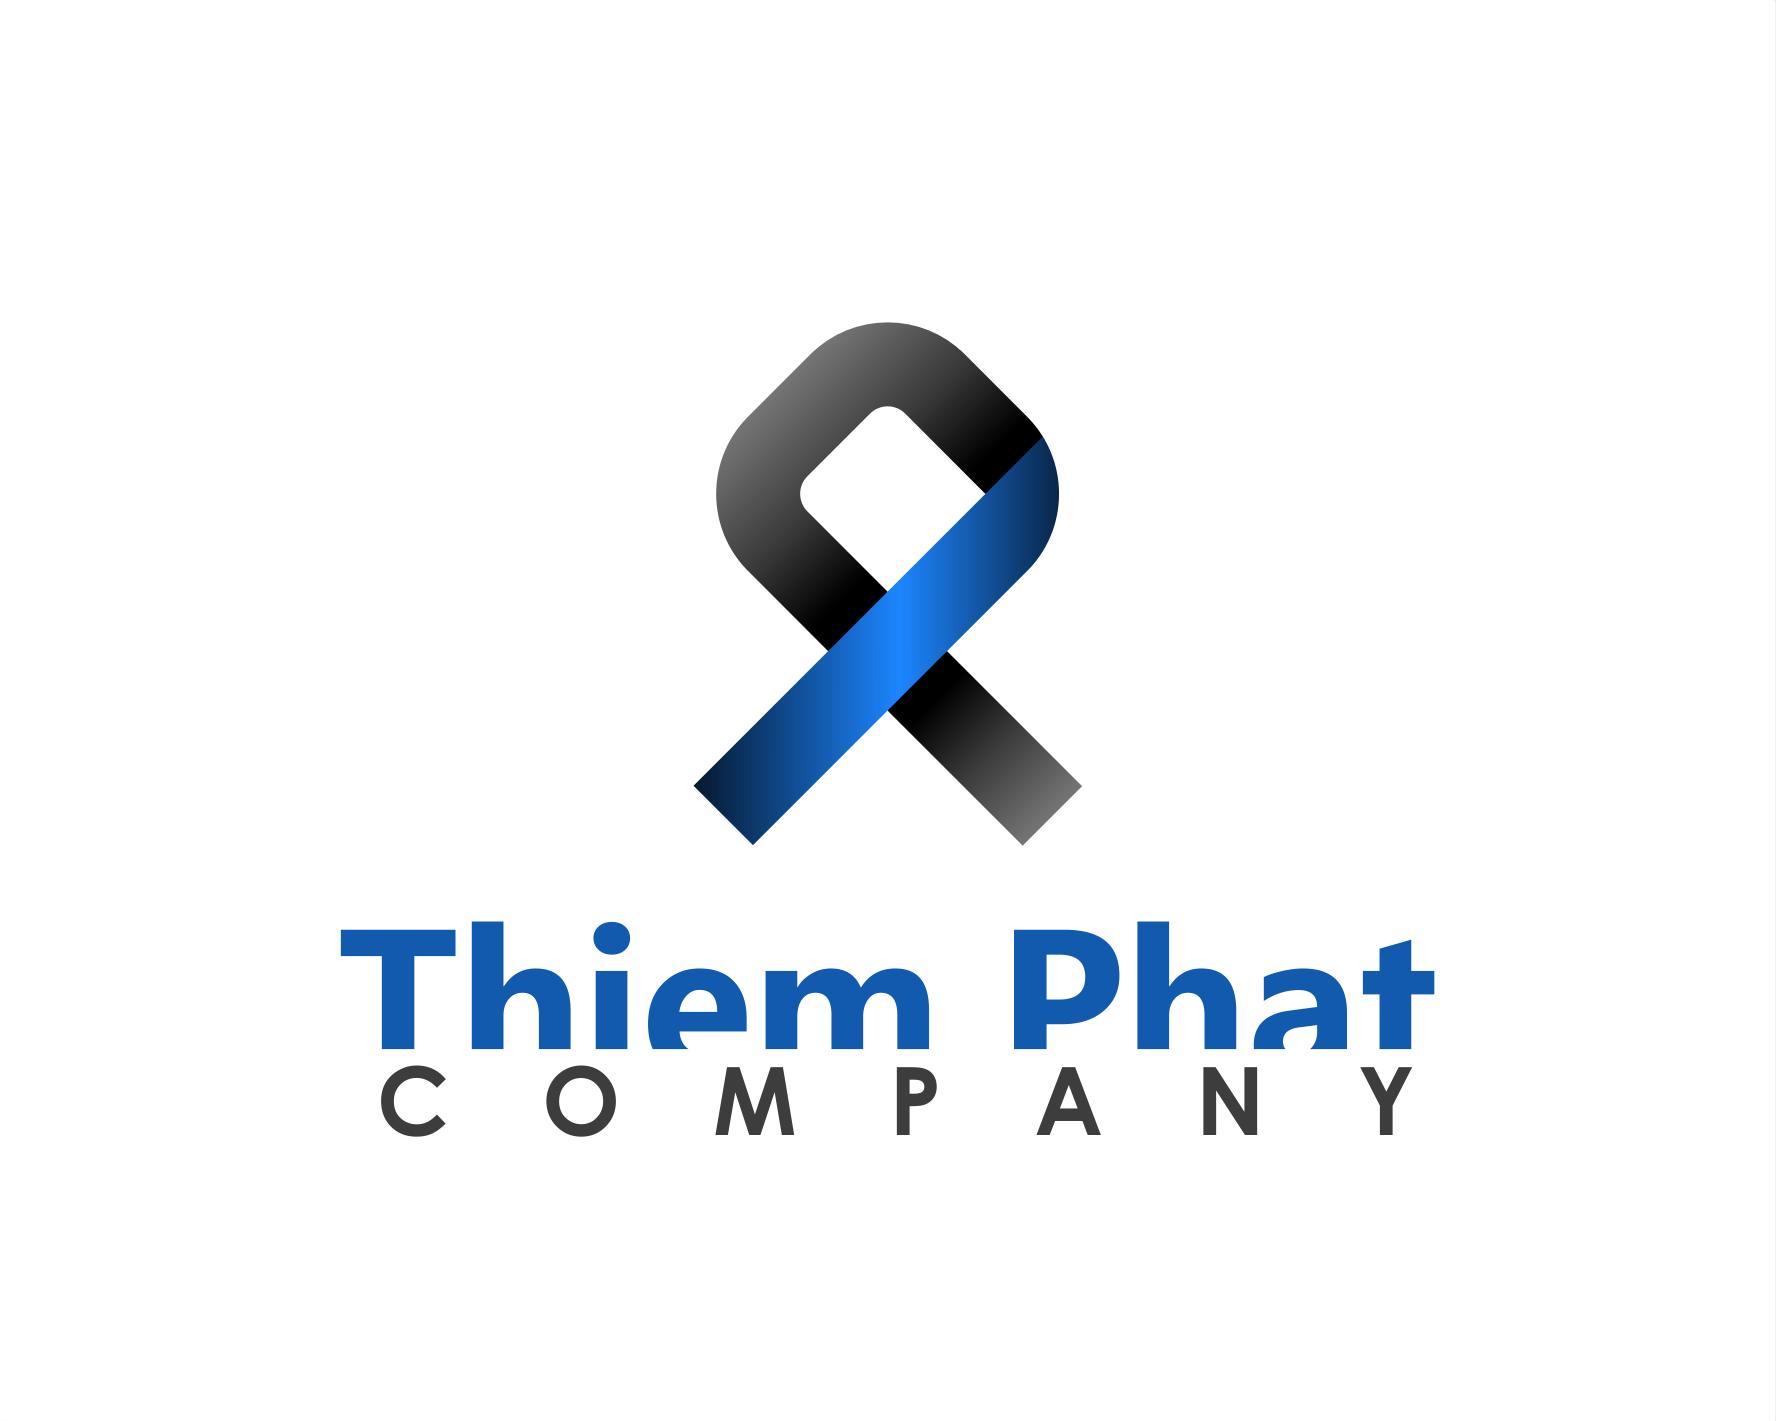 Logo Design by Net Bih - Entry No. 50 in the Logo Design Contest New Logo Design for Thiem Phat company.